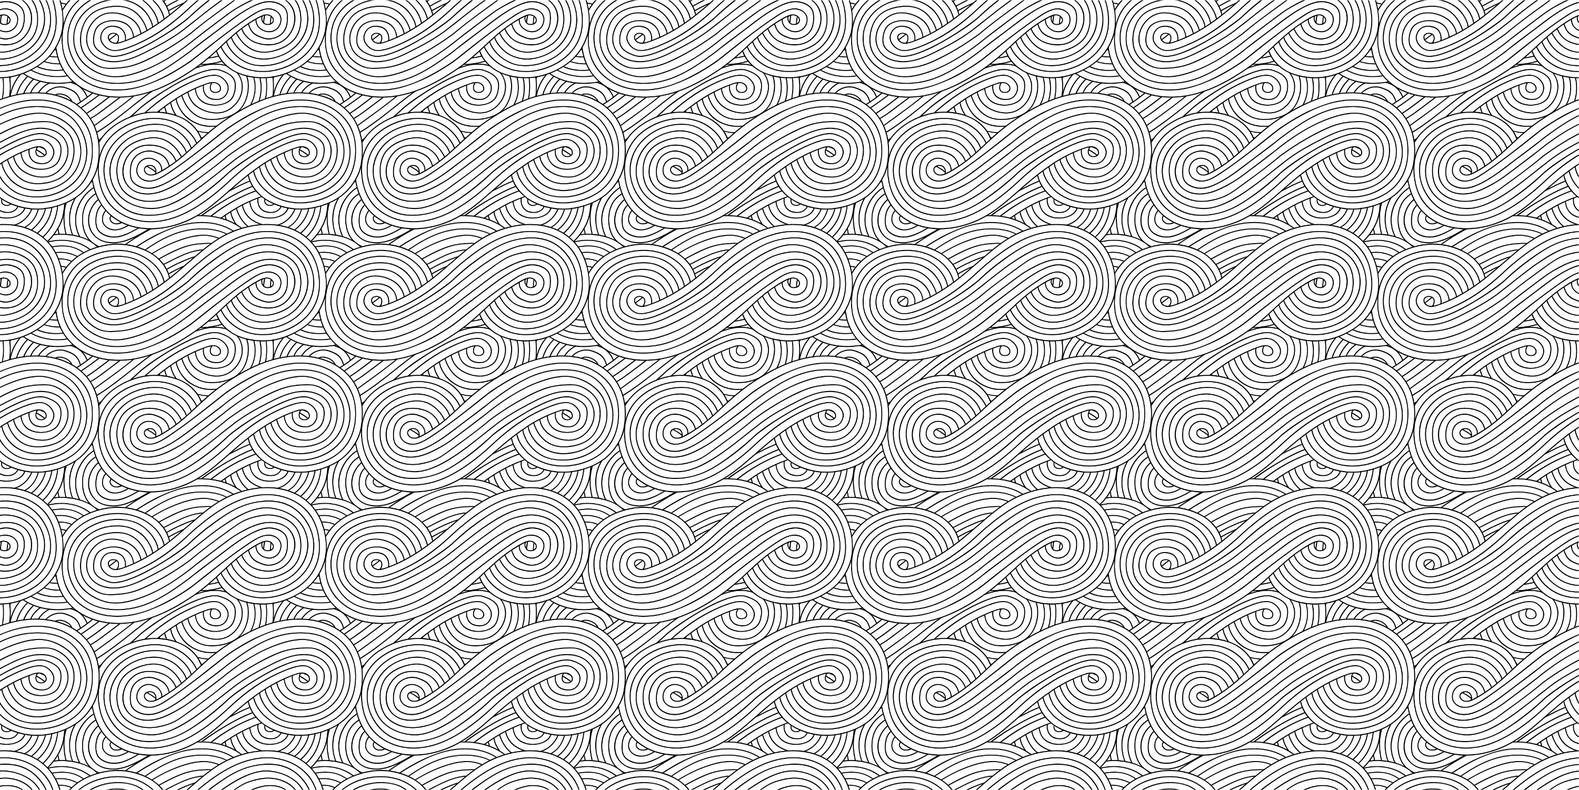 corrosco%20pattern%20gigante_edited.png